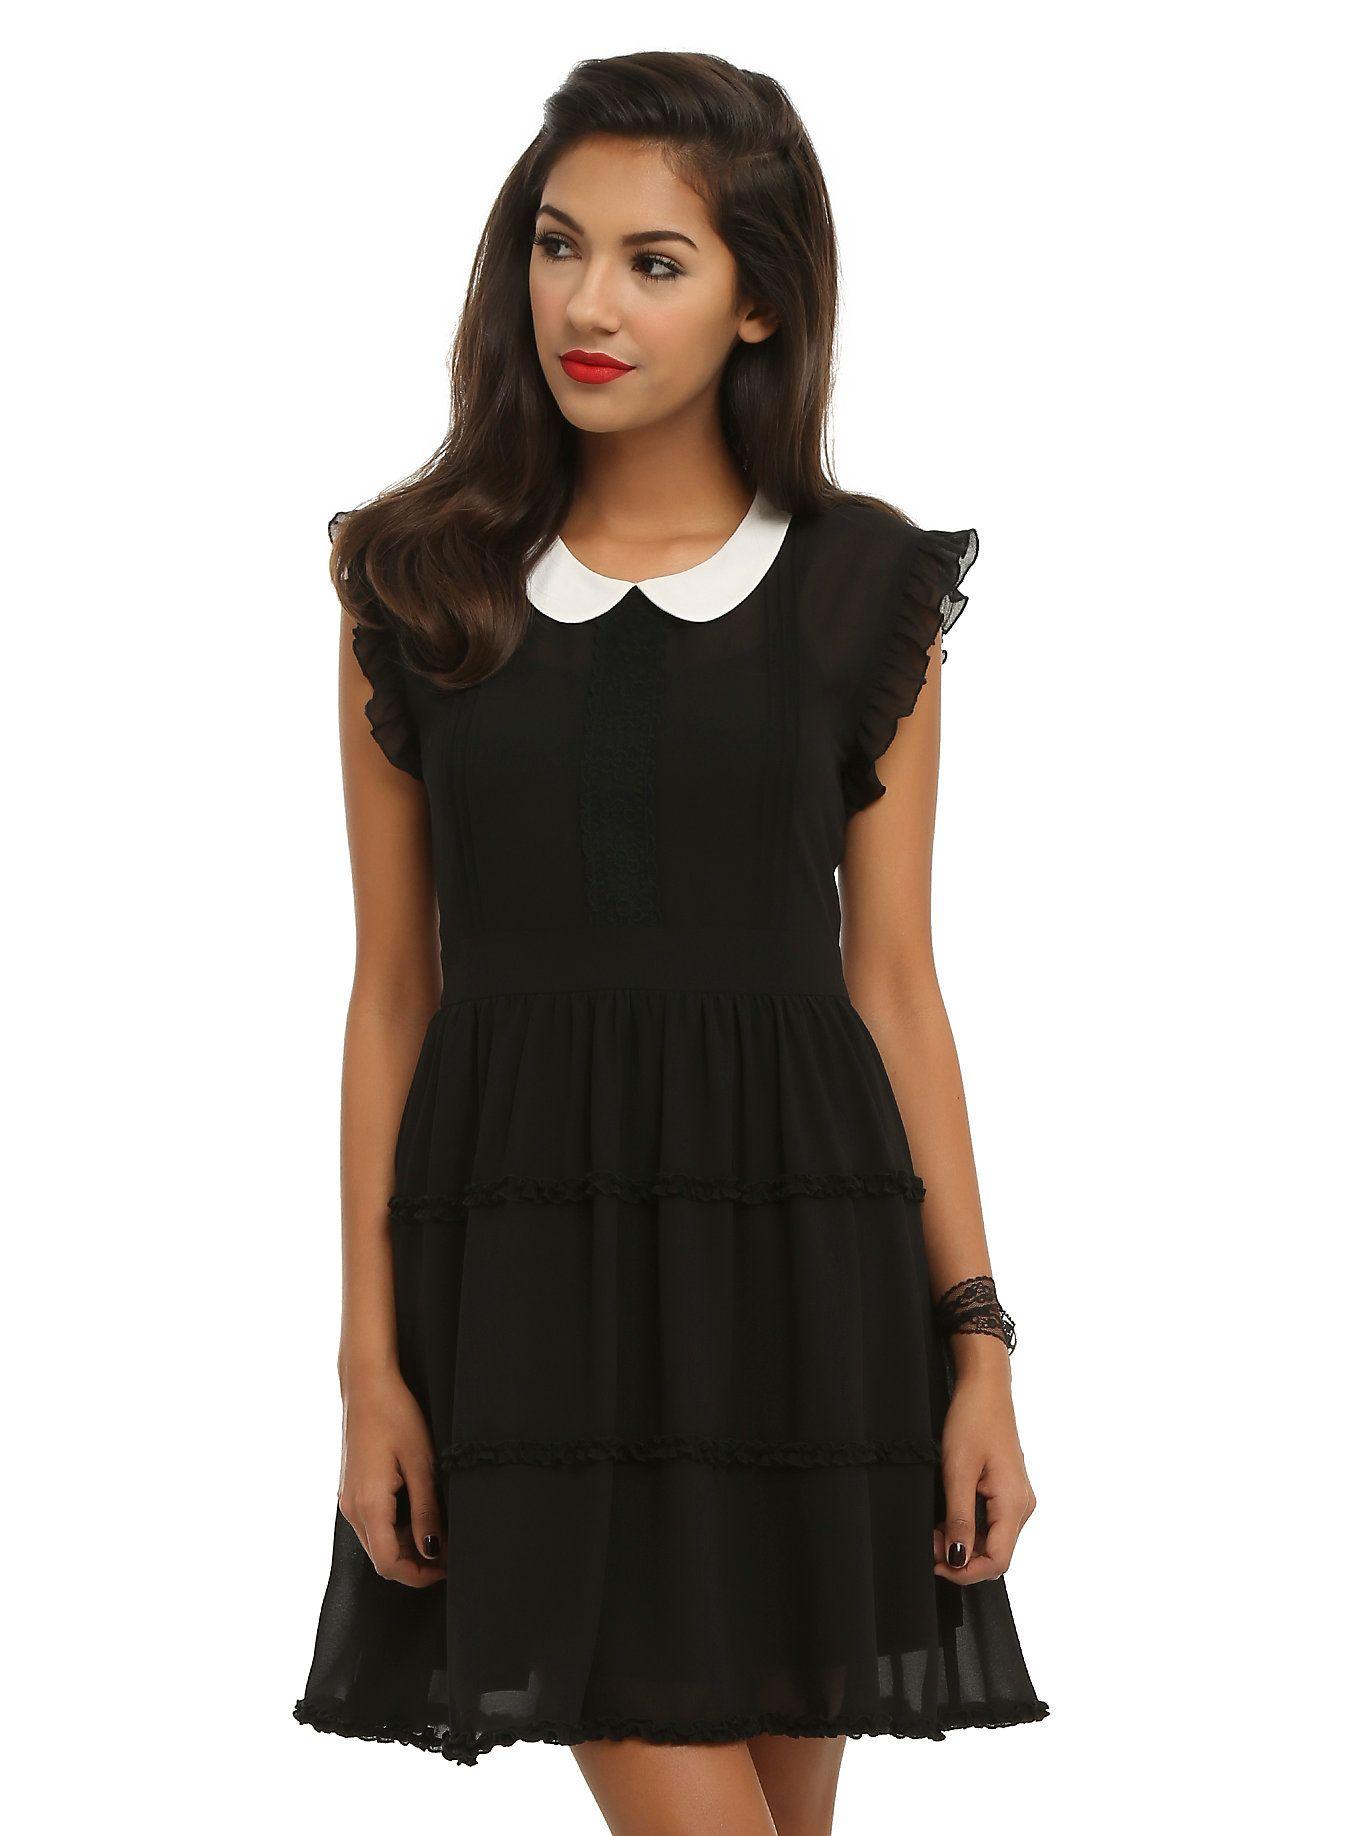 Black White Collar Chiffon Dress Black Chiffon Dress Chiffon Dress Black Ruffle Dress [ 1836 x 1360 Pixel ]